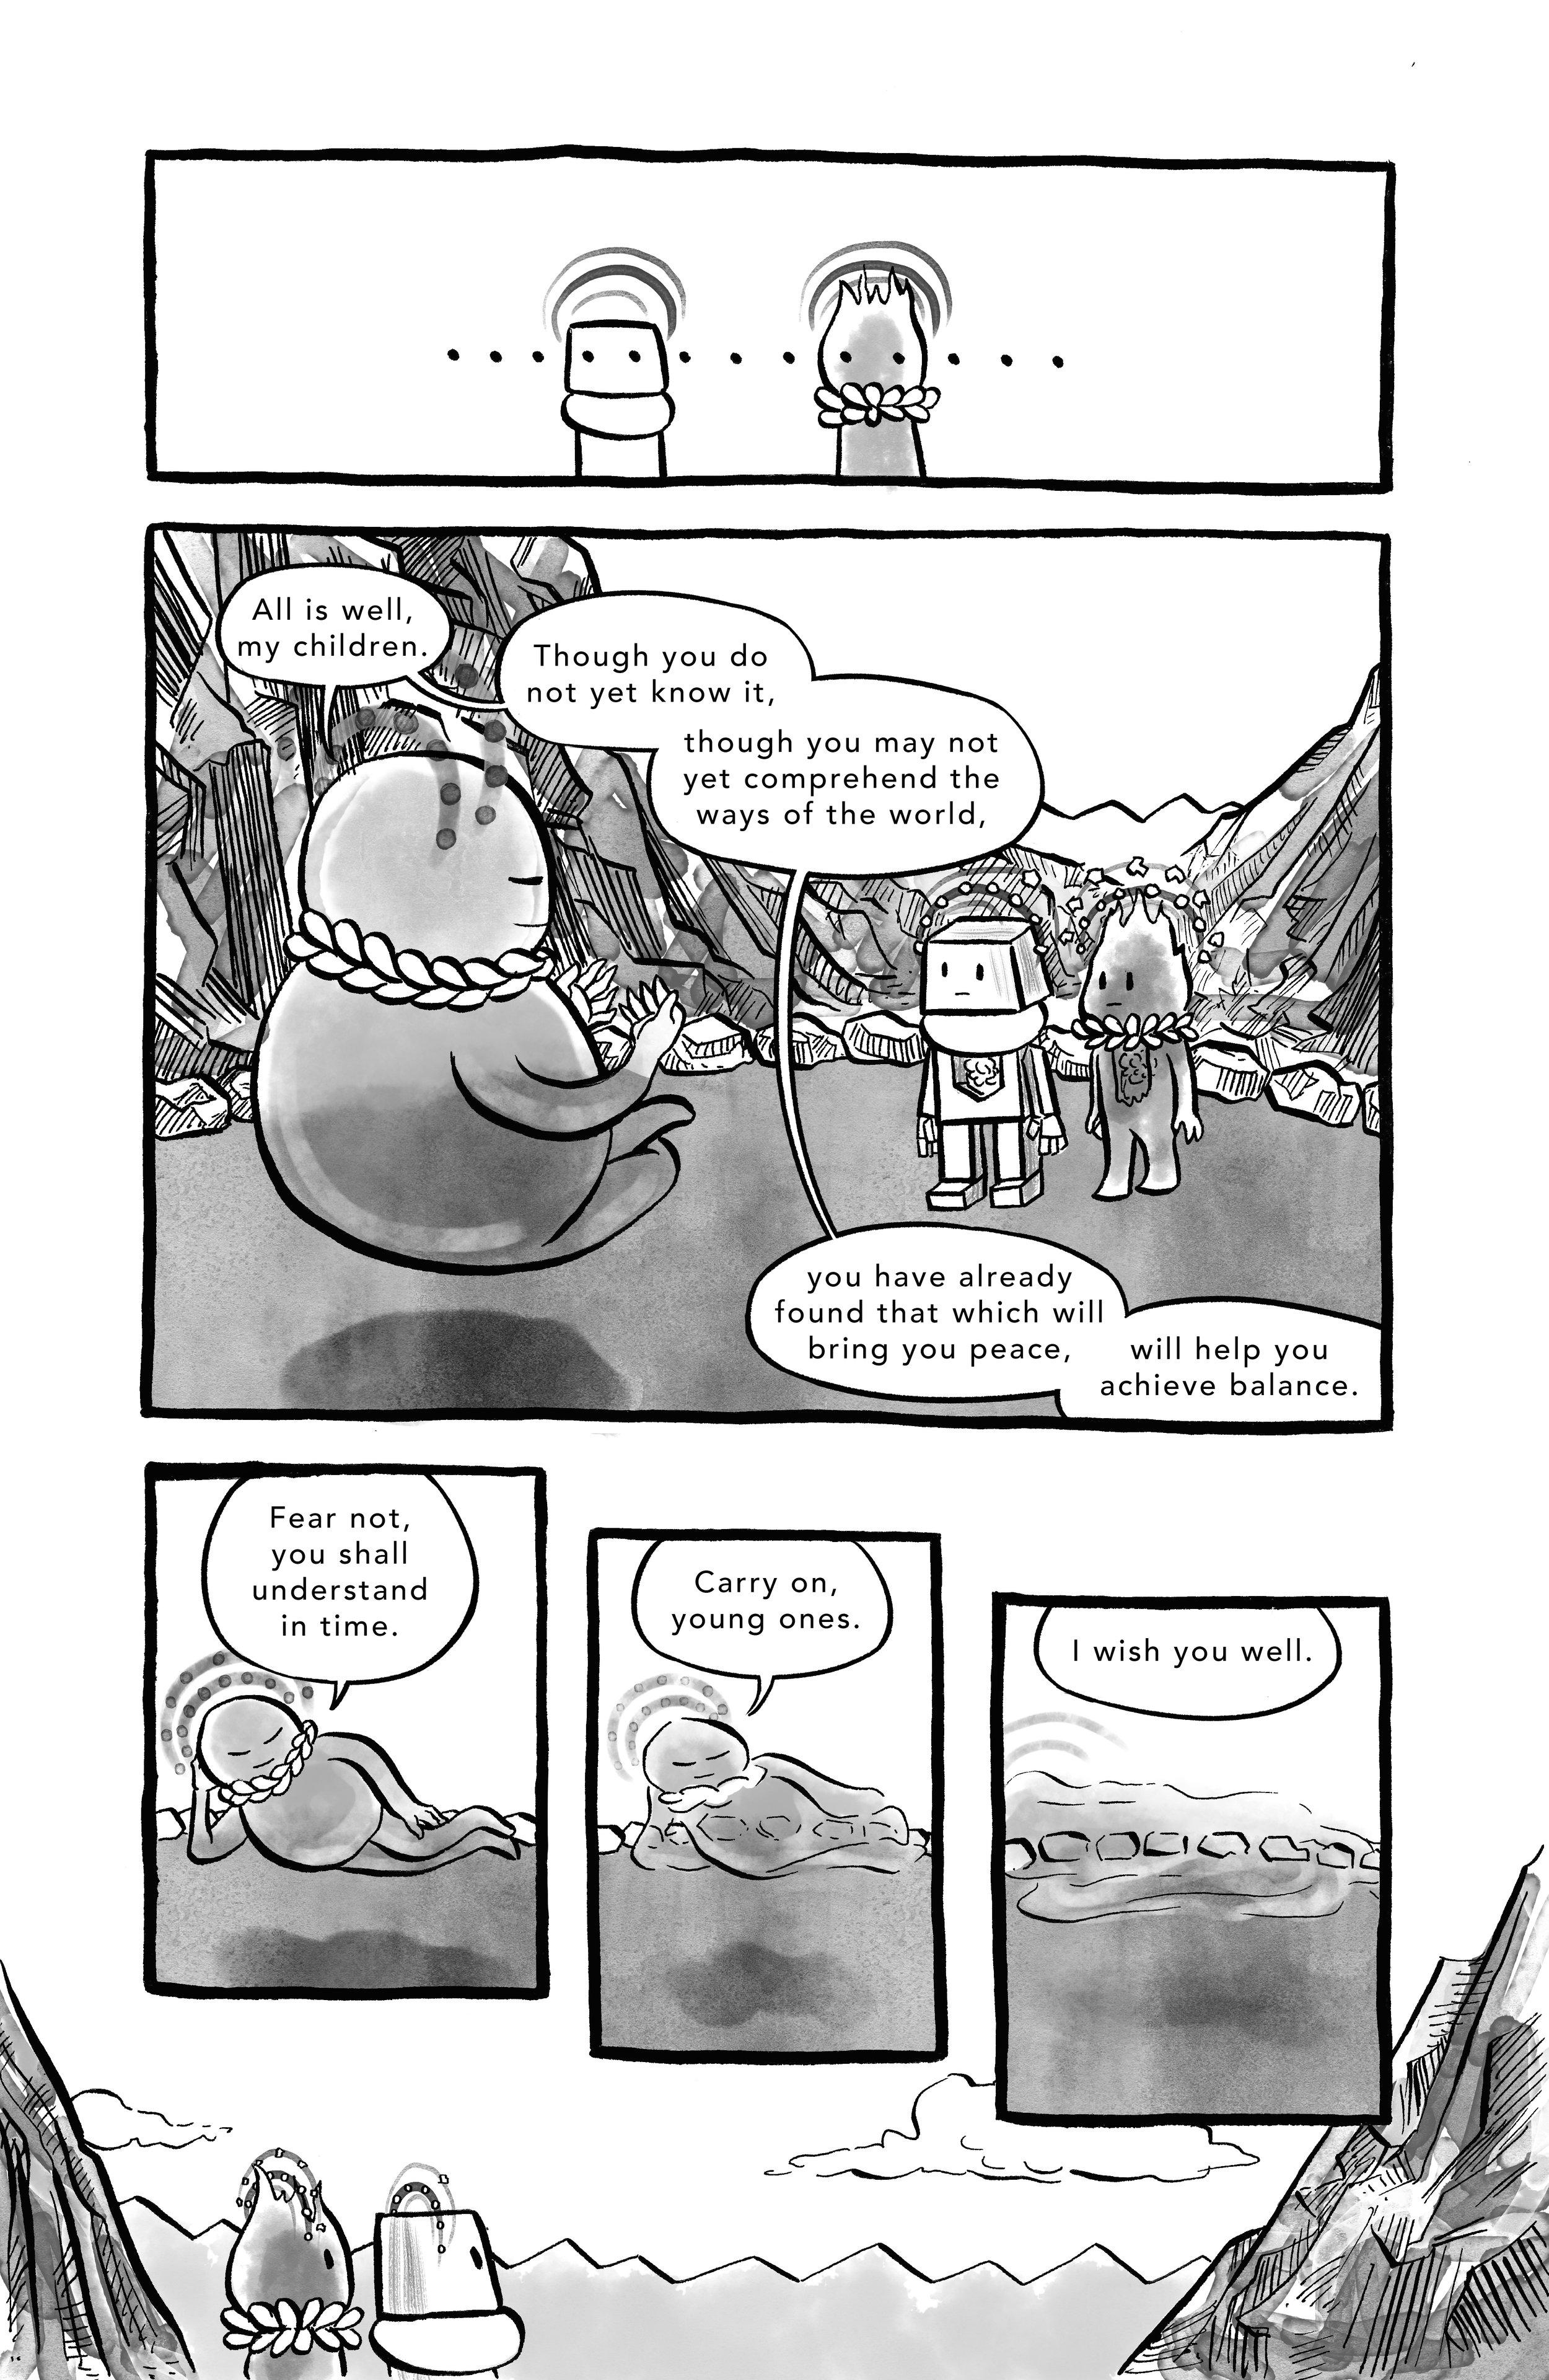 Octet p. 9